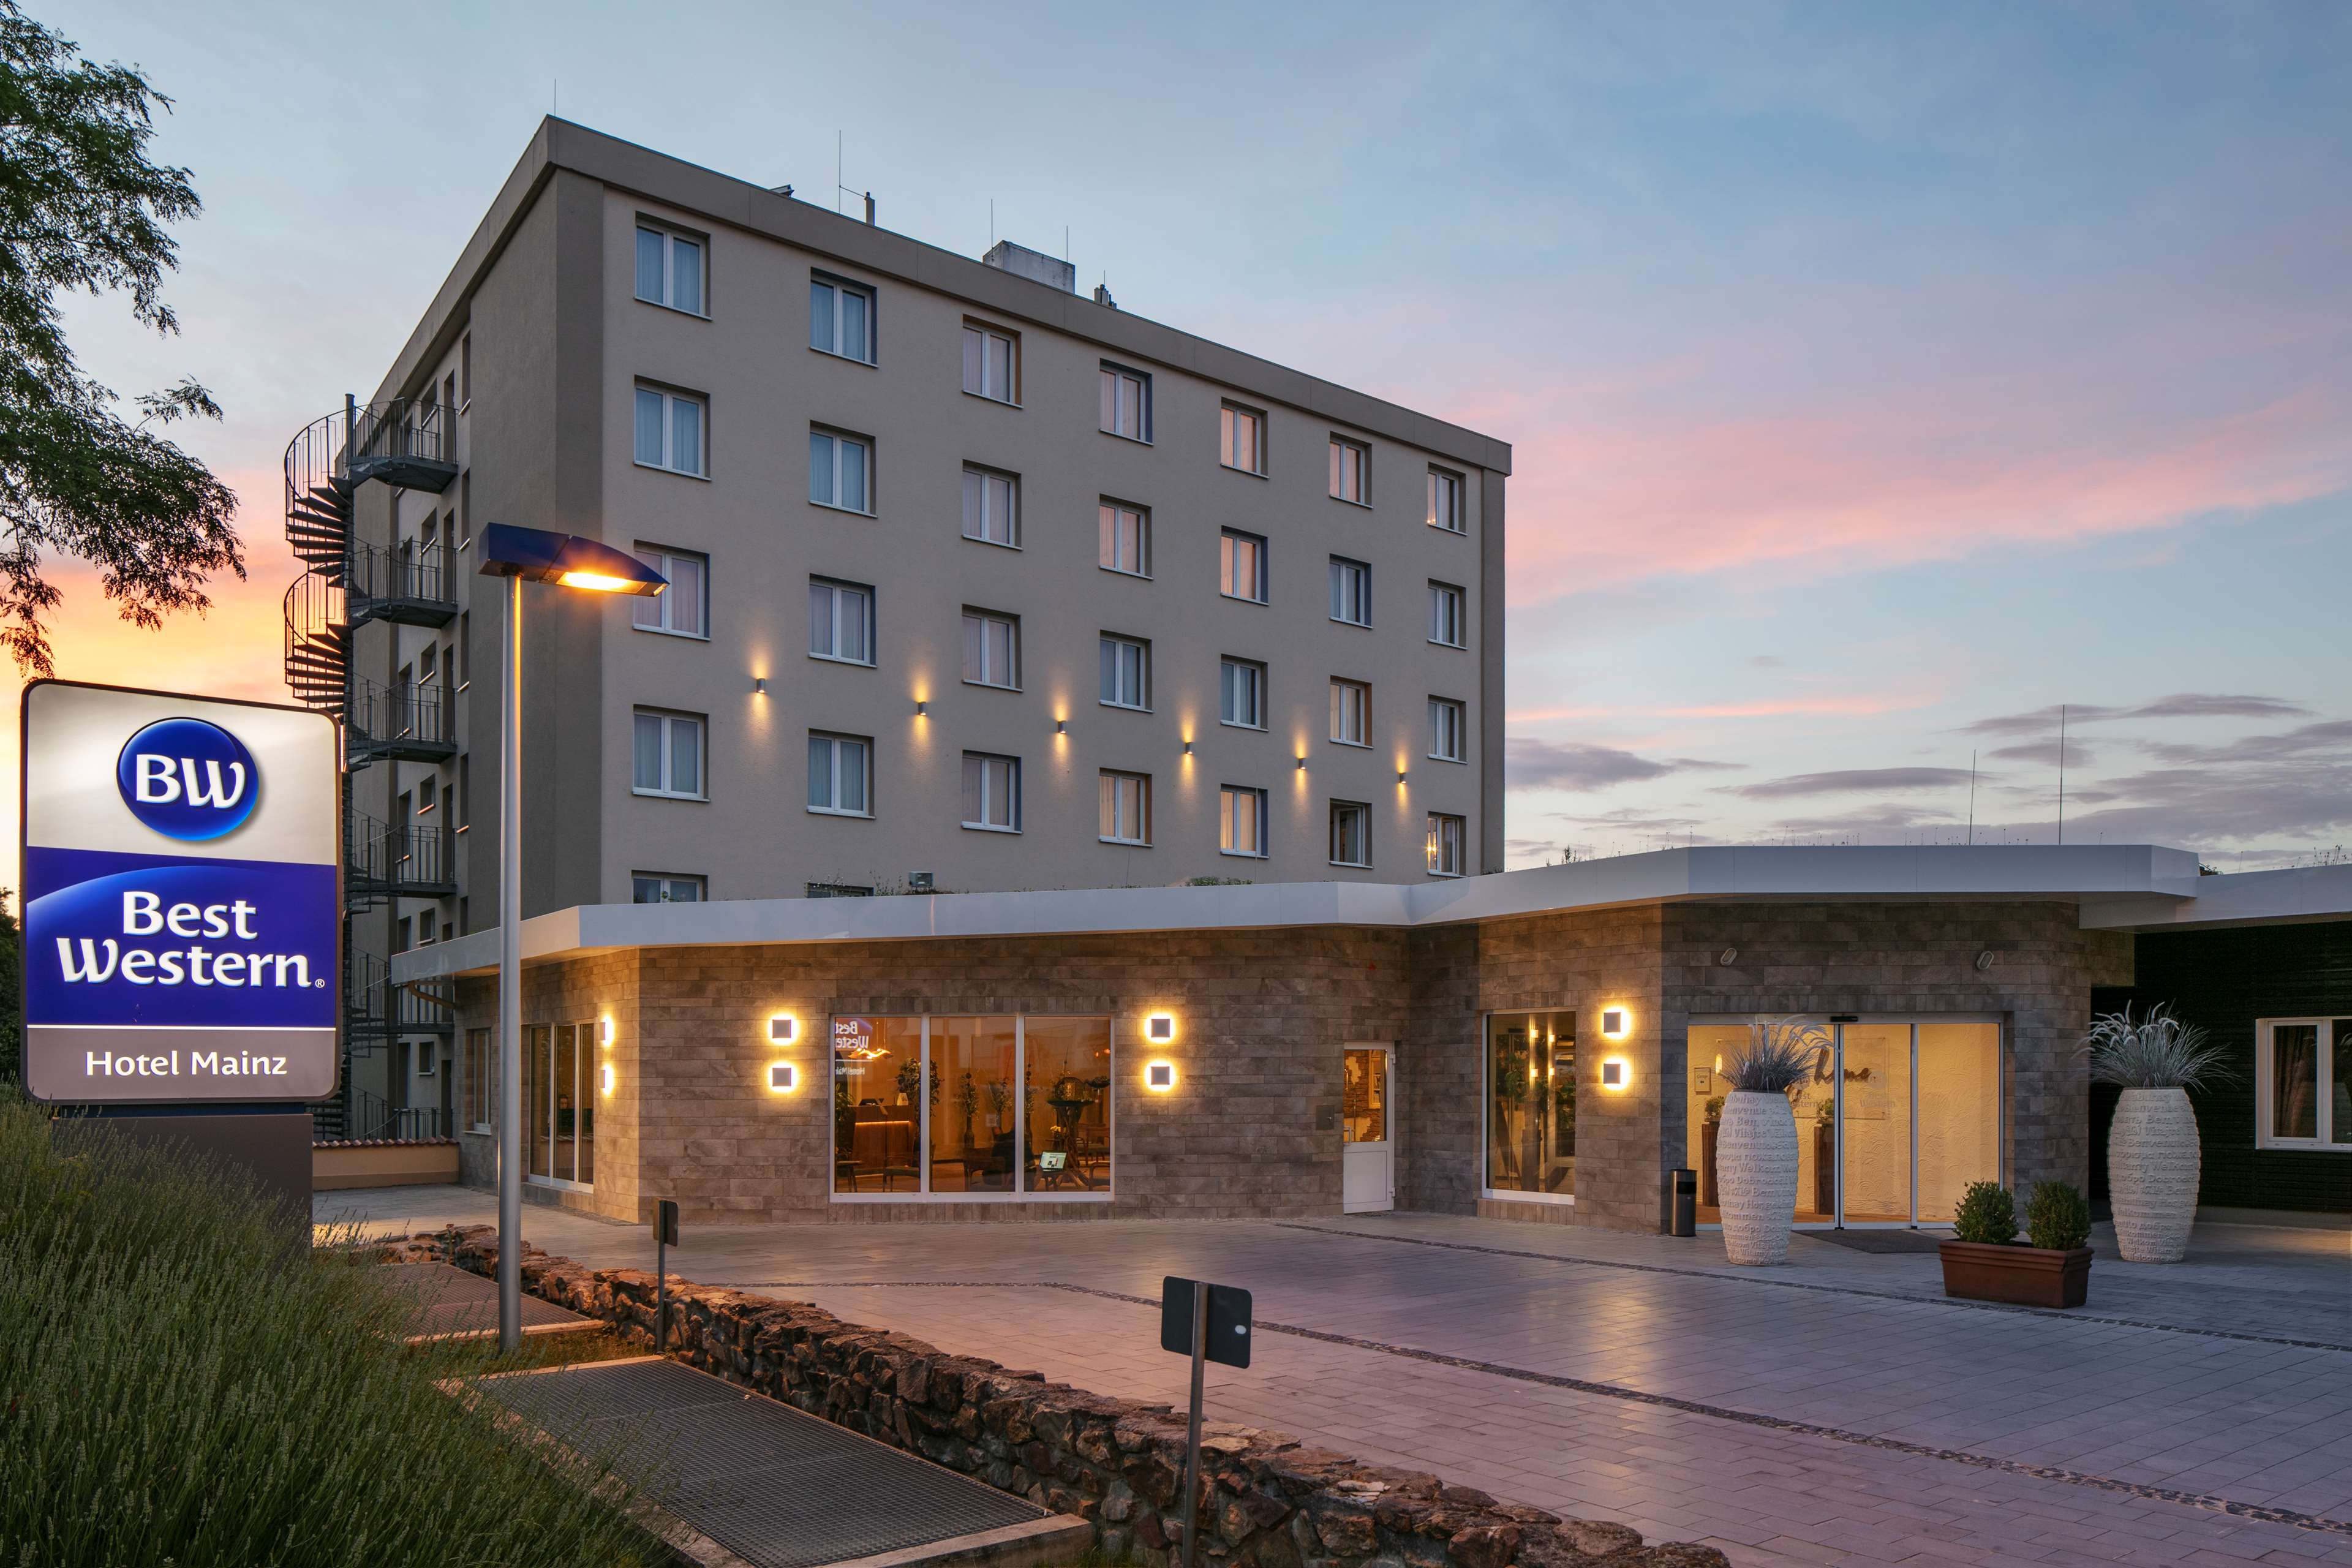 Best Western Hotel Mainz Mainz Price Address Reviews